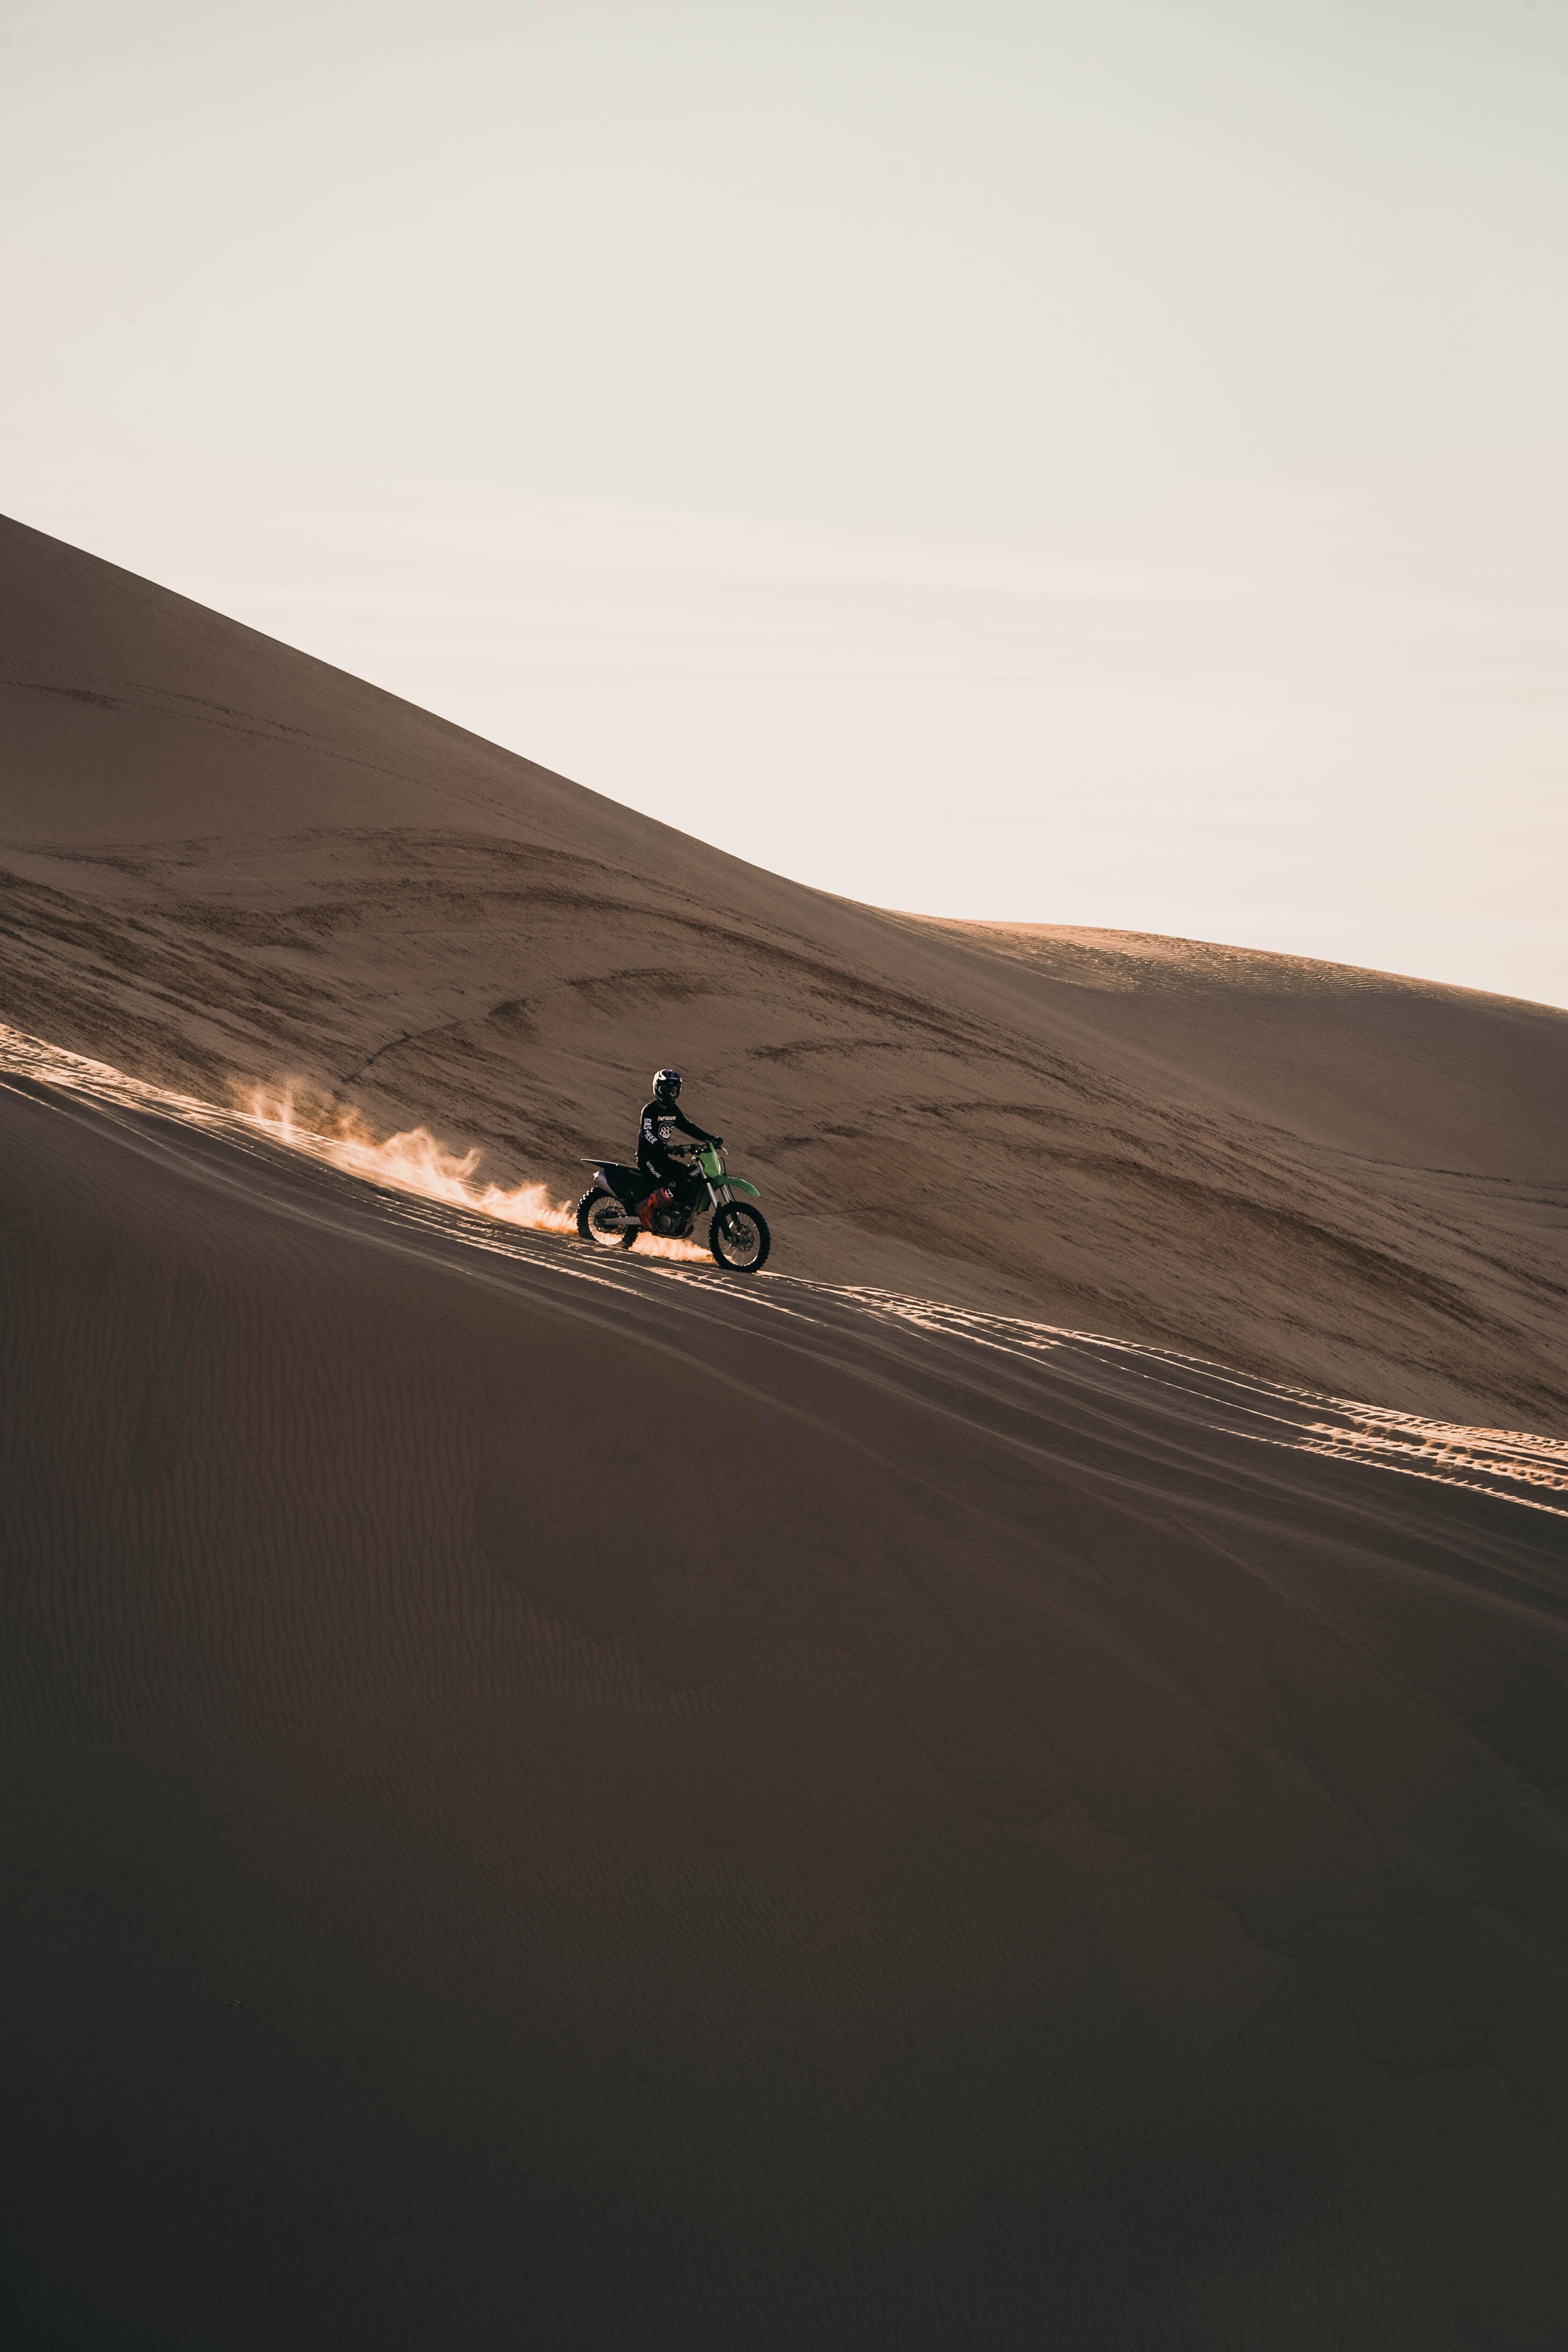 118694 скачать обои Мотоциклы, Пустыня, Ралли, Мотоциклист, Мотоцикл, Байк - заставки и картинки бесплатно